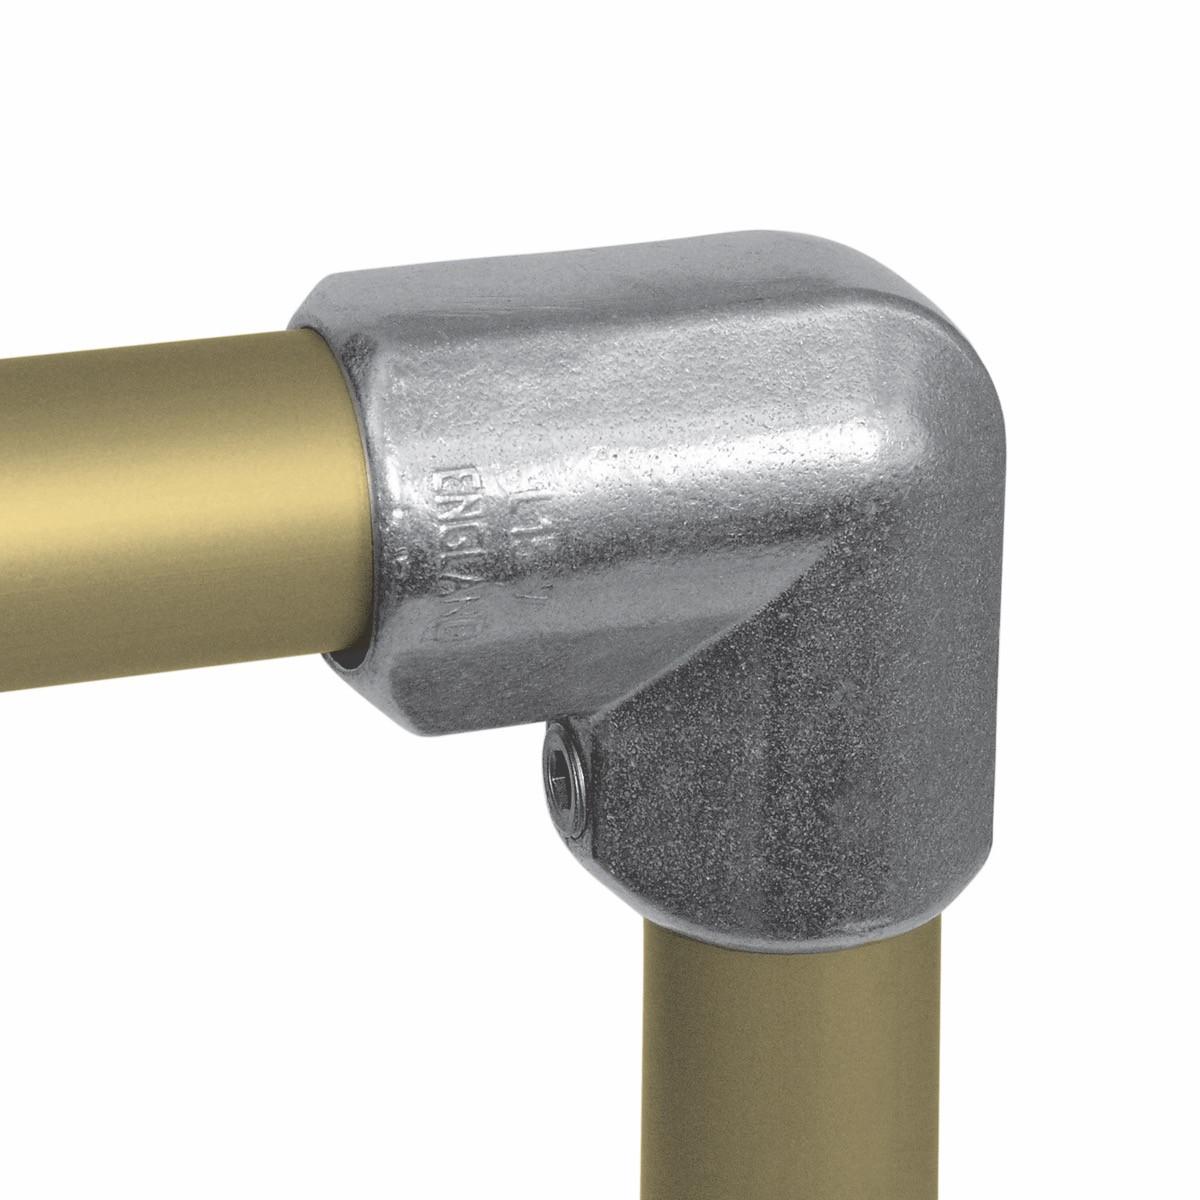 L15 - 90° Elbow